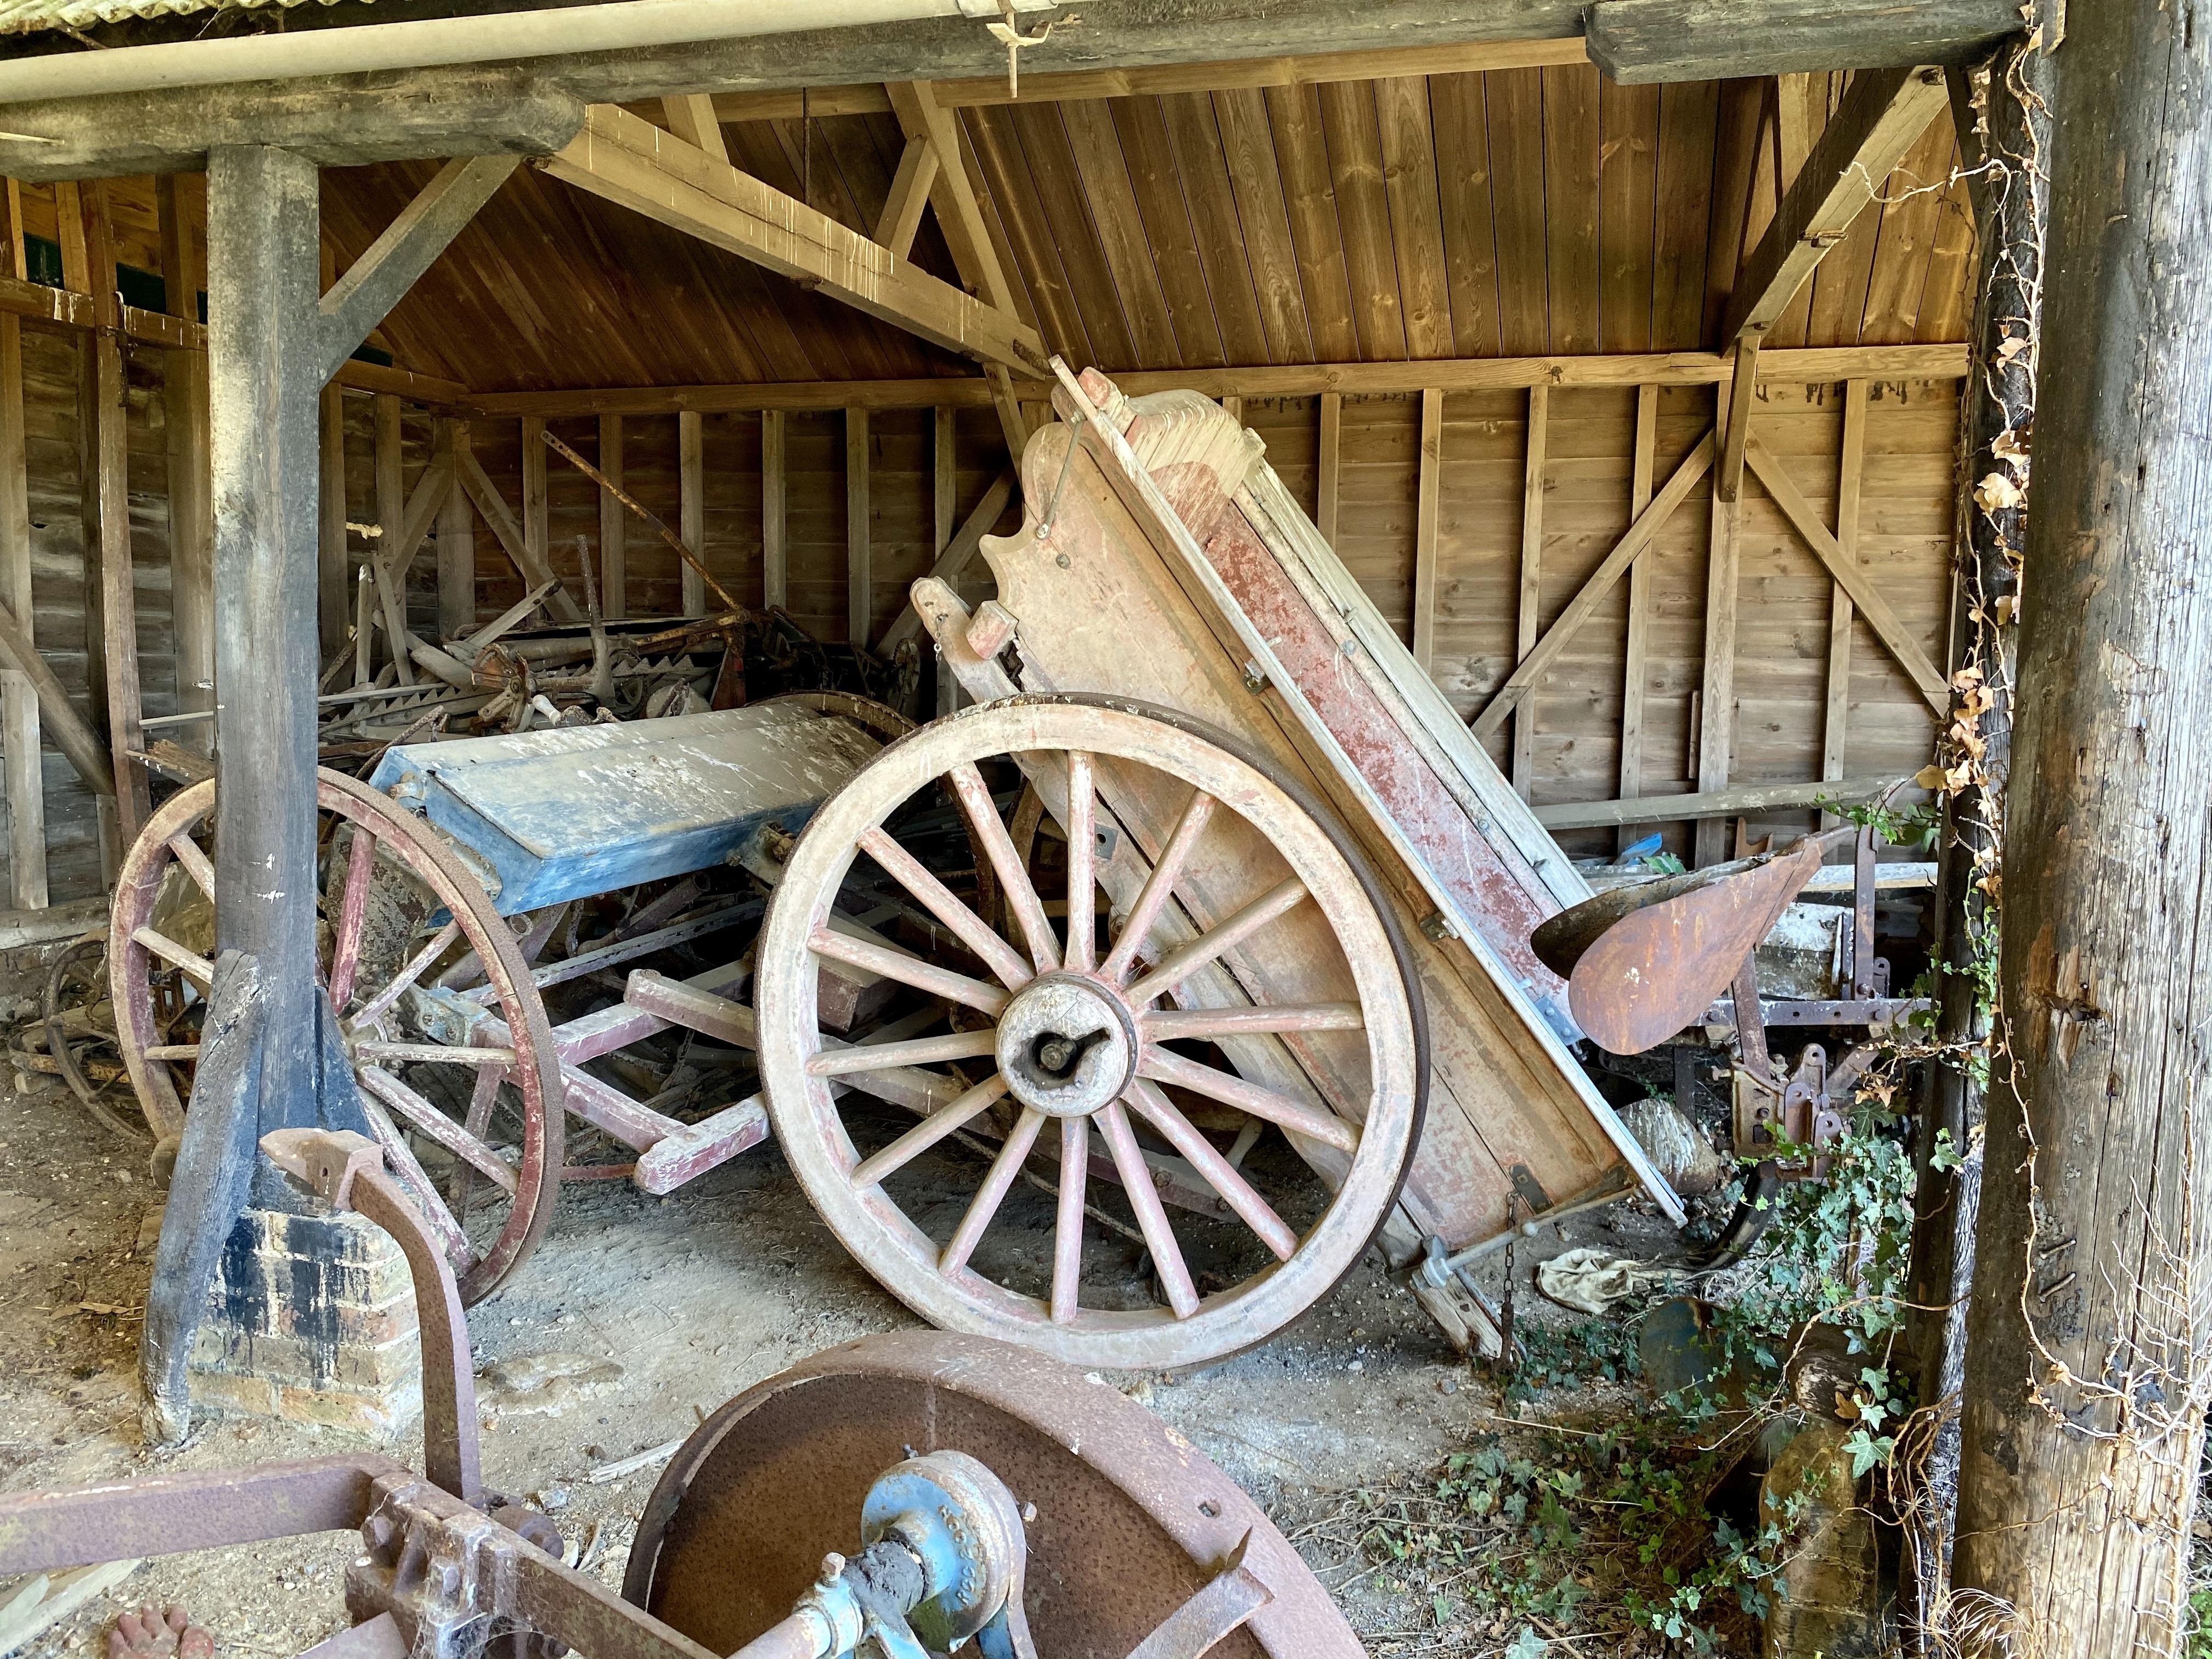 Richard Squires cart